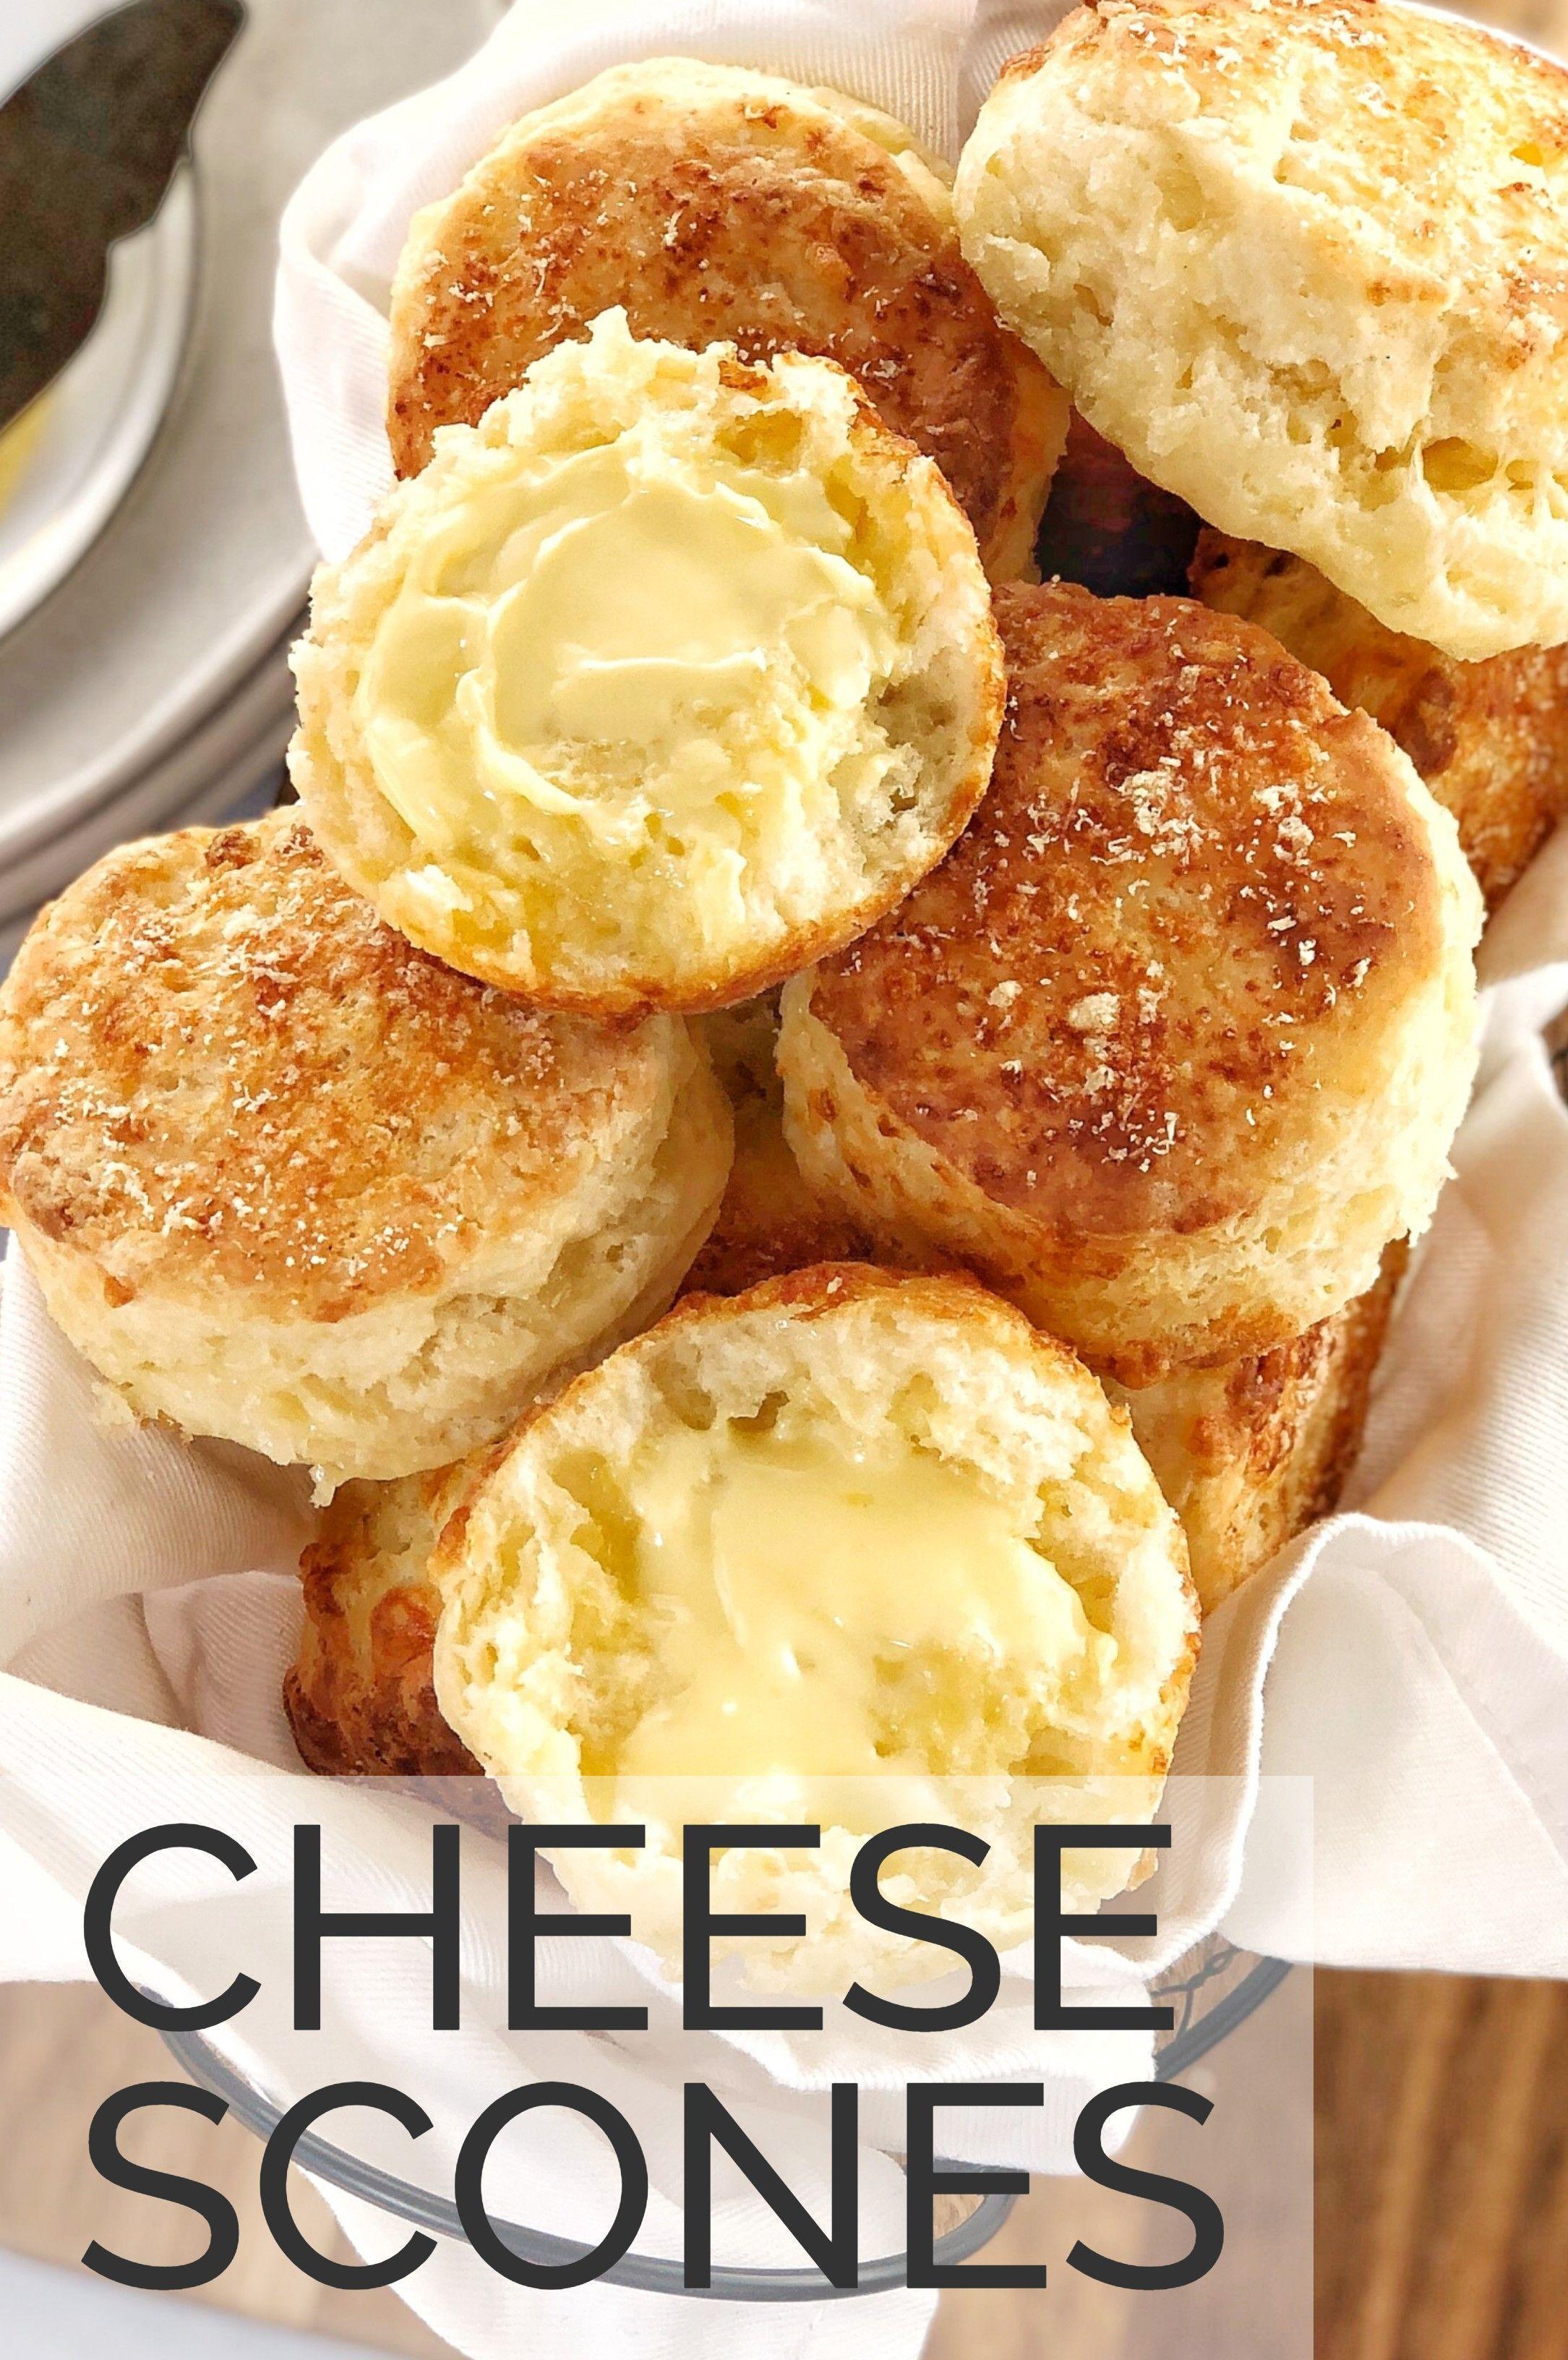 Cheese Scones In 2020 Cheese Scones Savoury Food Easy Delicious Recipes